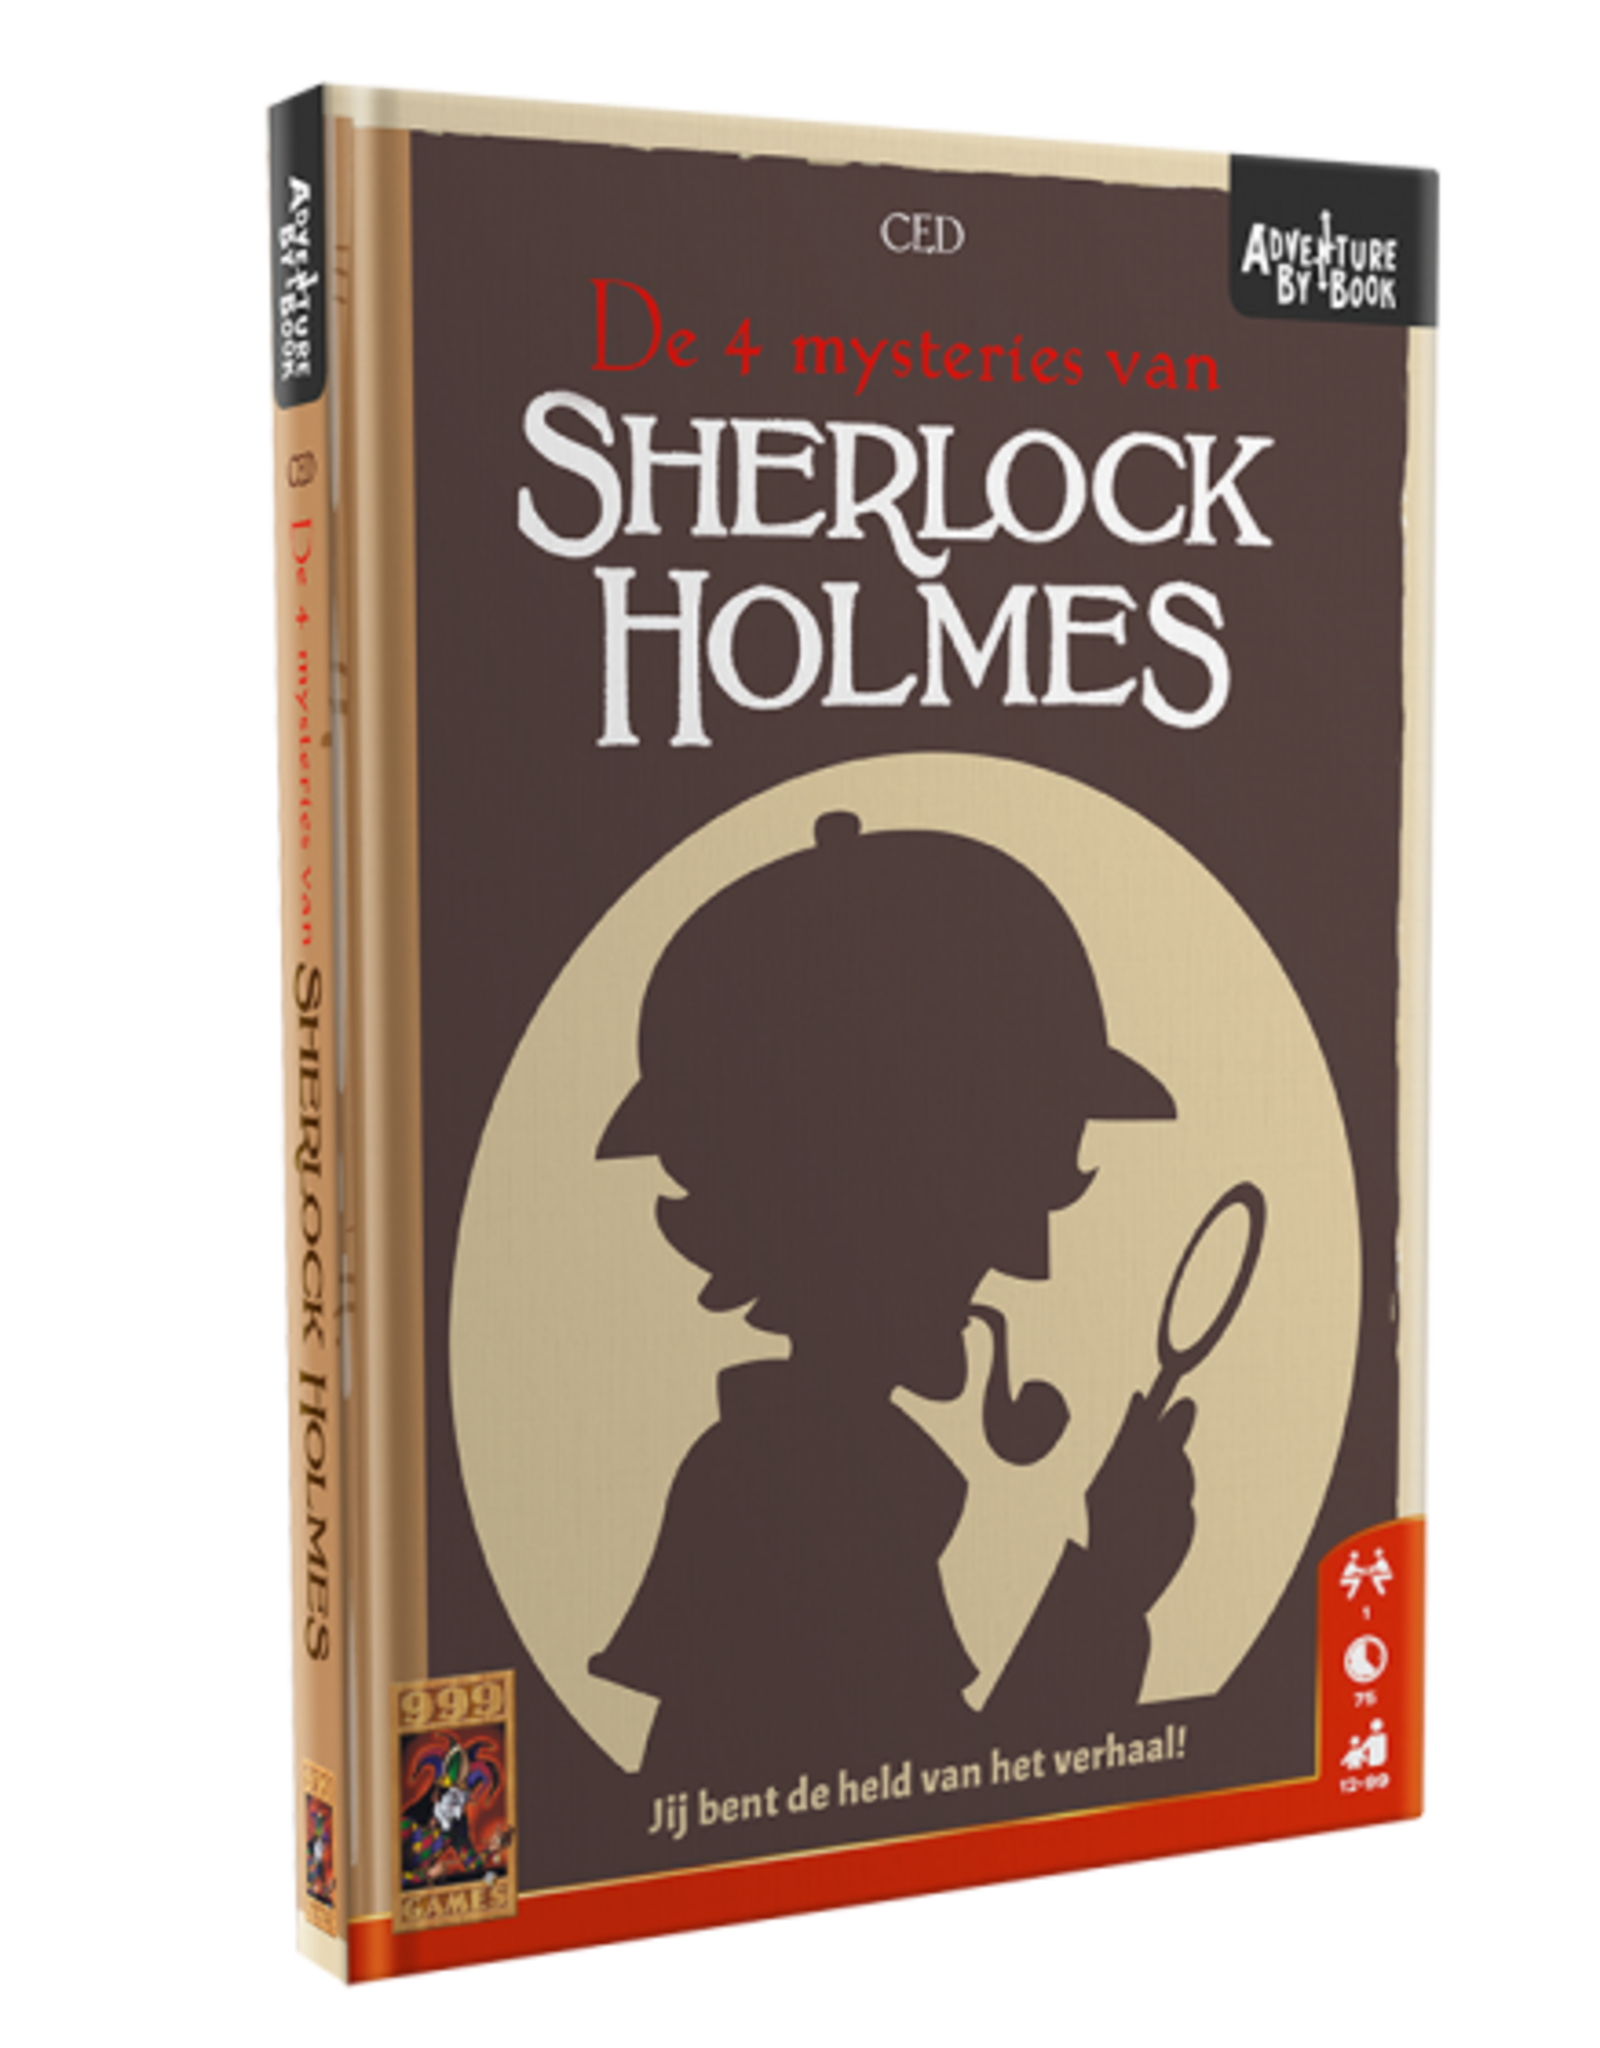 999 Games Adventure by Book: Sherlock Holmes